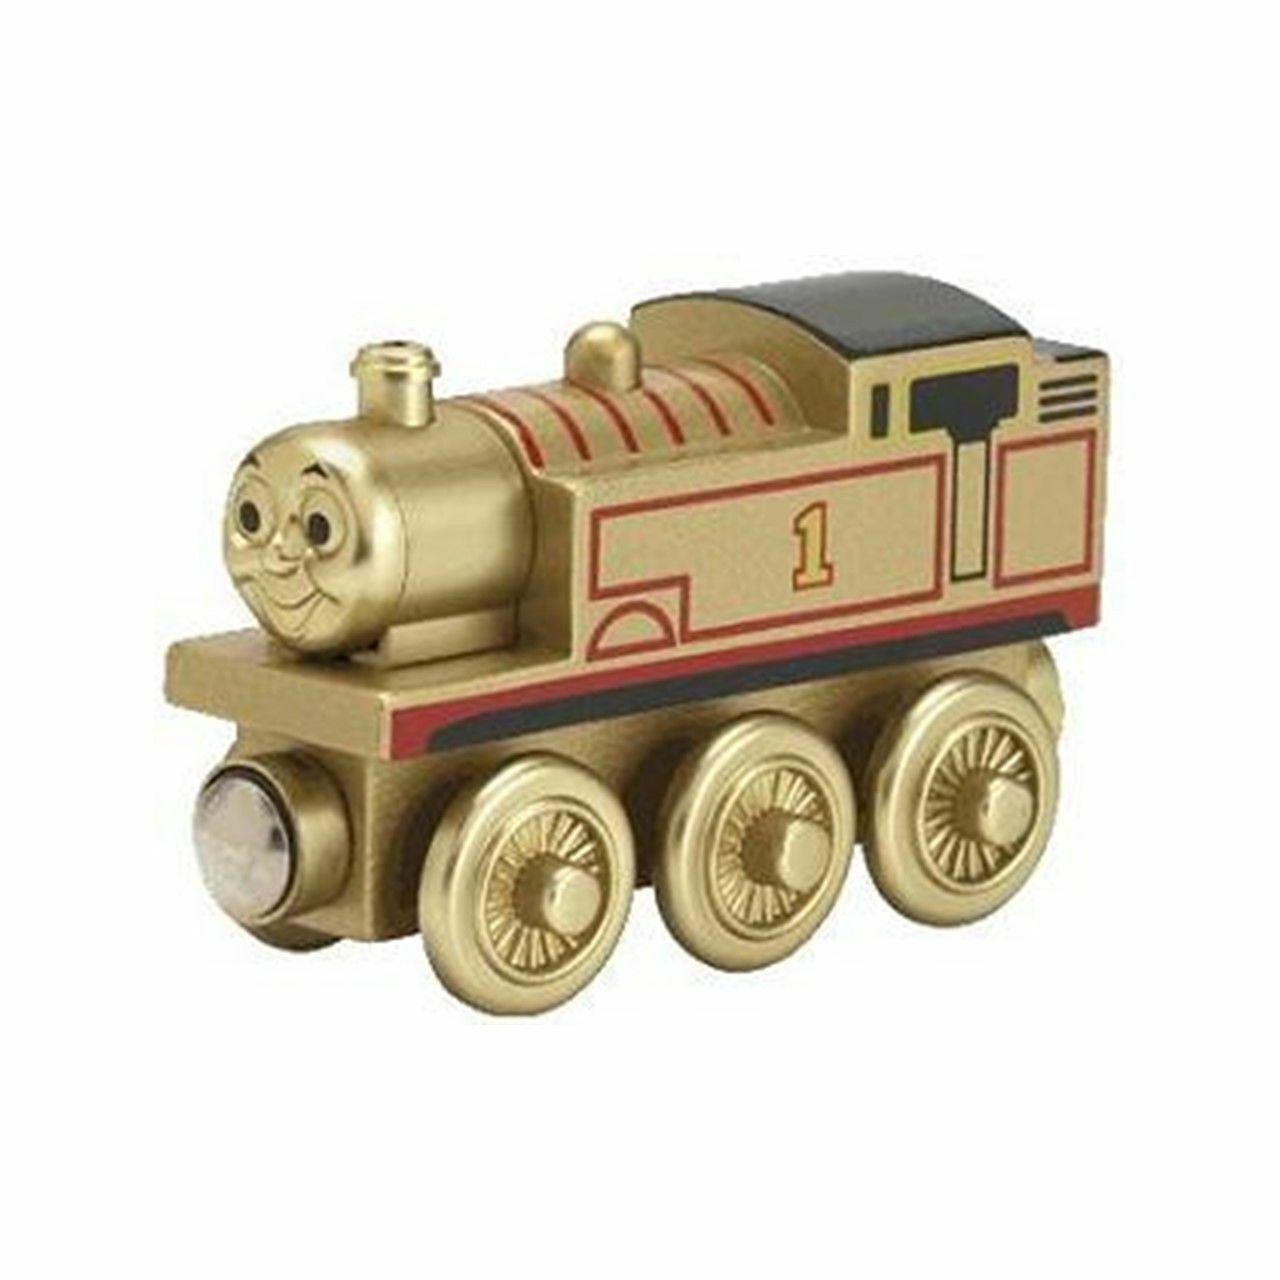 Golden Thomas The Tank Engine Holzen Gold 60 Years Anniversary Engine - BNIB